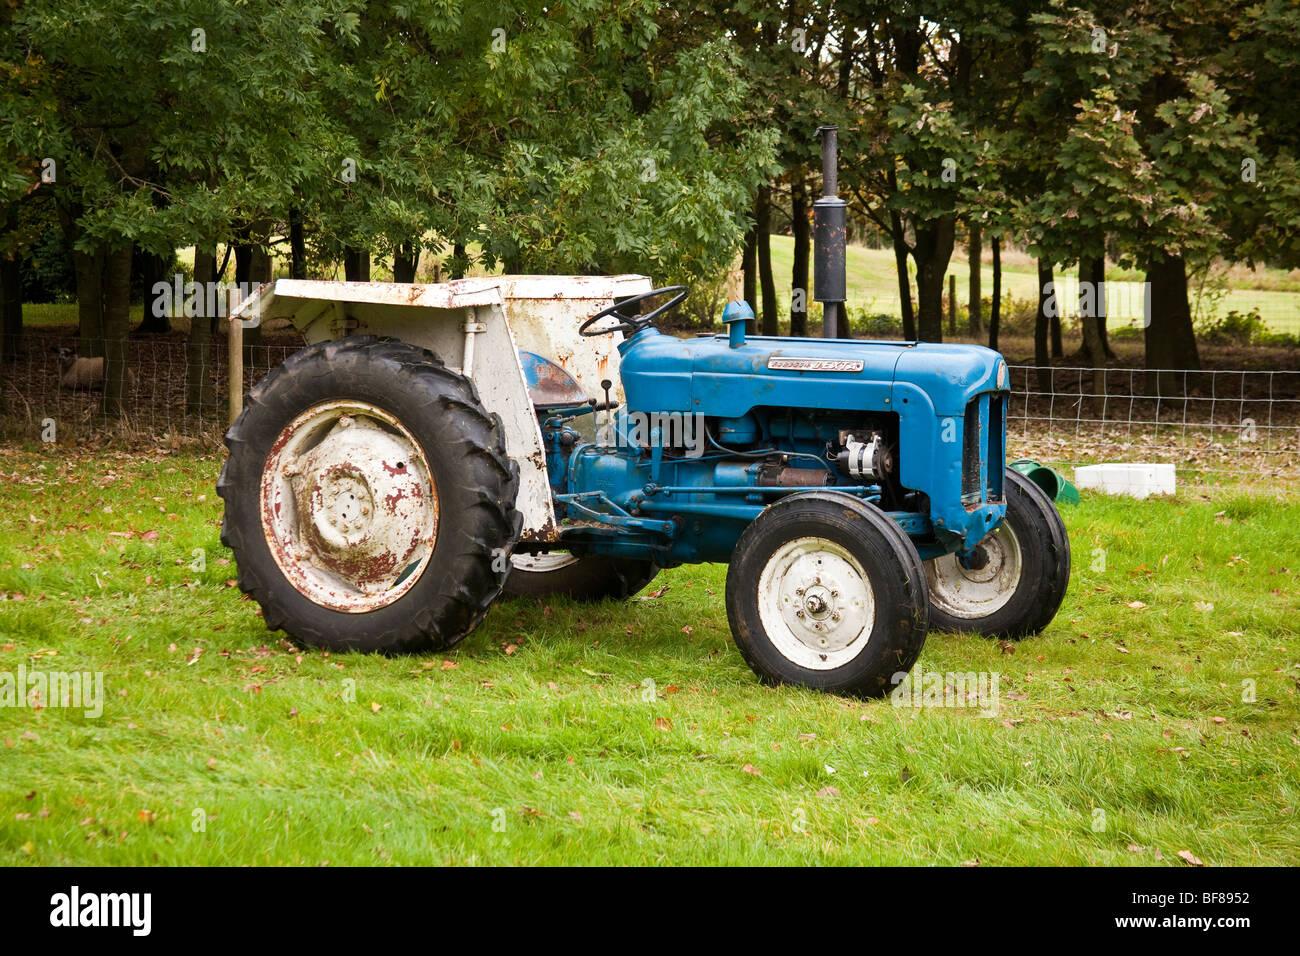 Fordson Dexta vintage tractor. - Stock Image